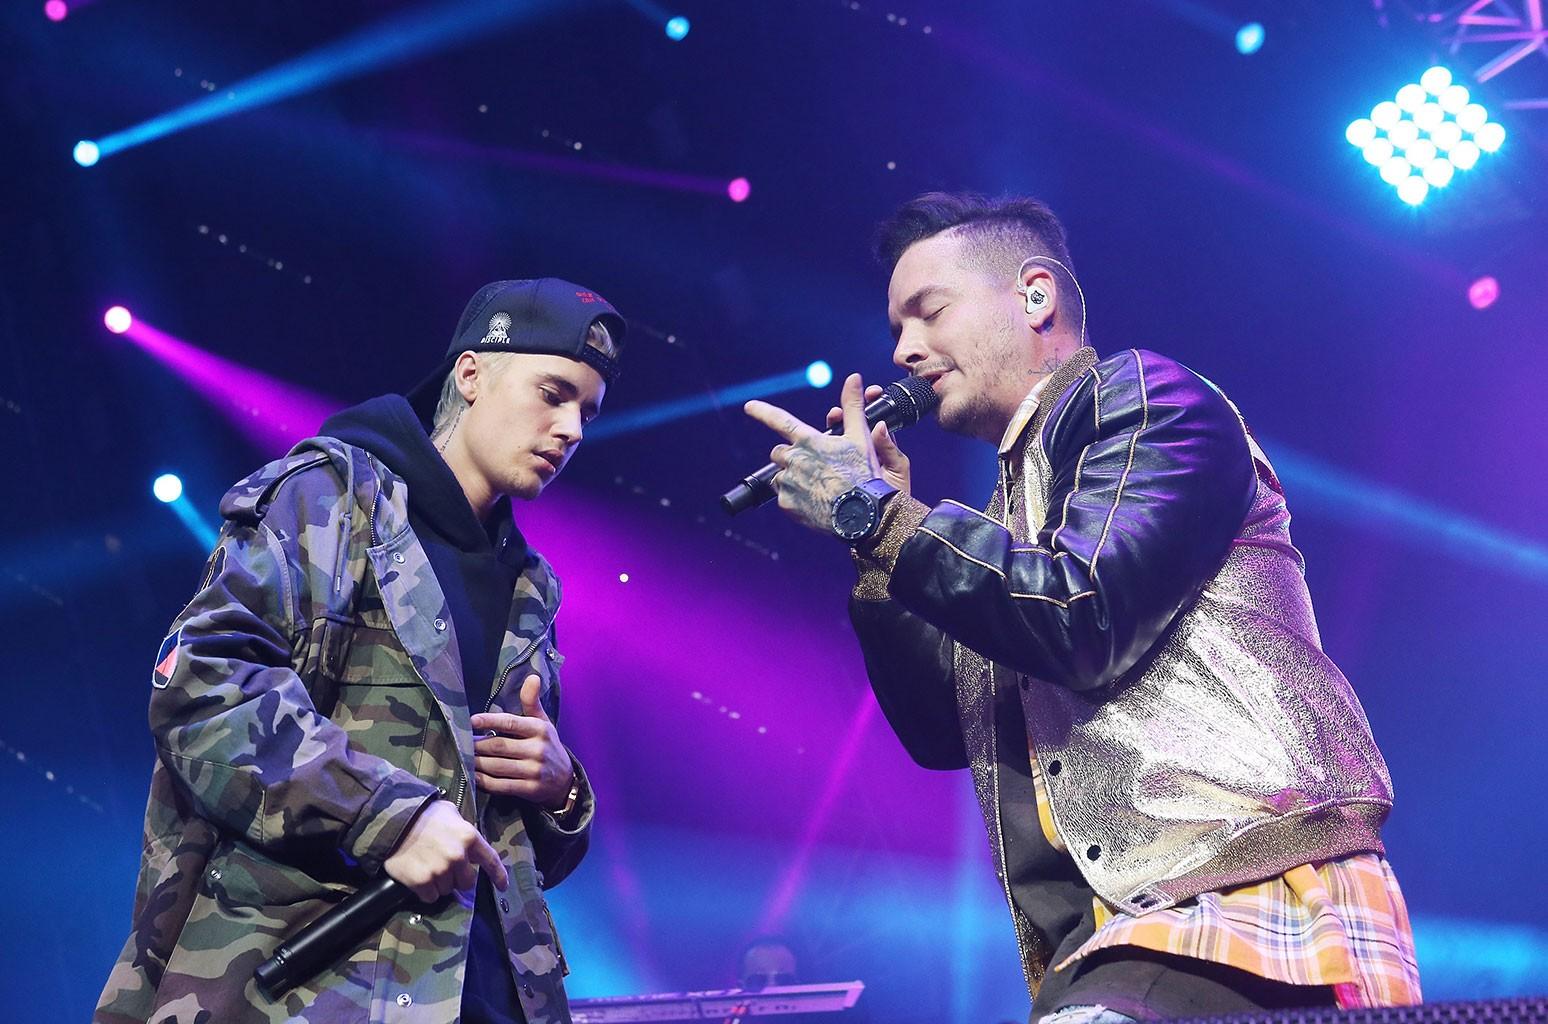 Justin Bieber and J Balvin